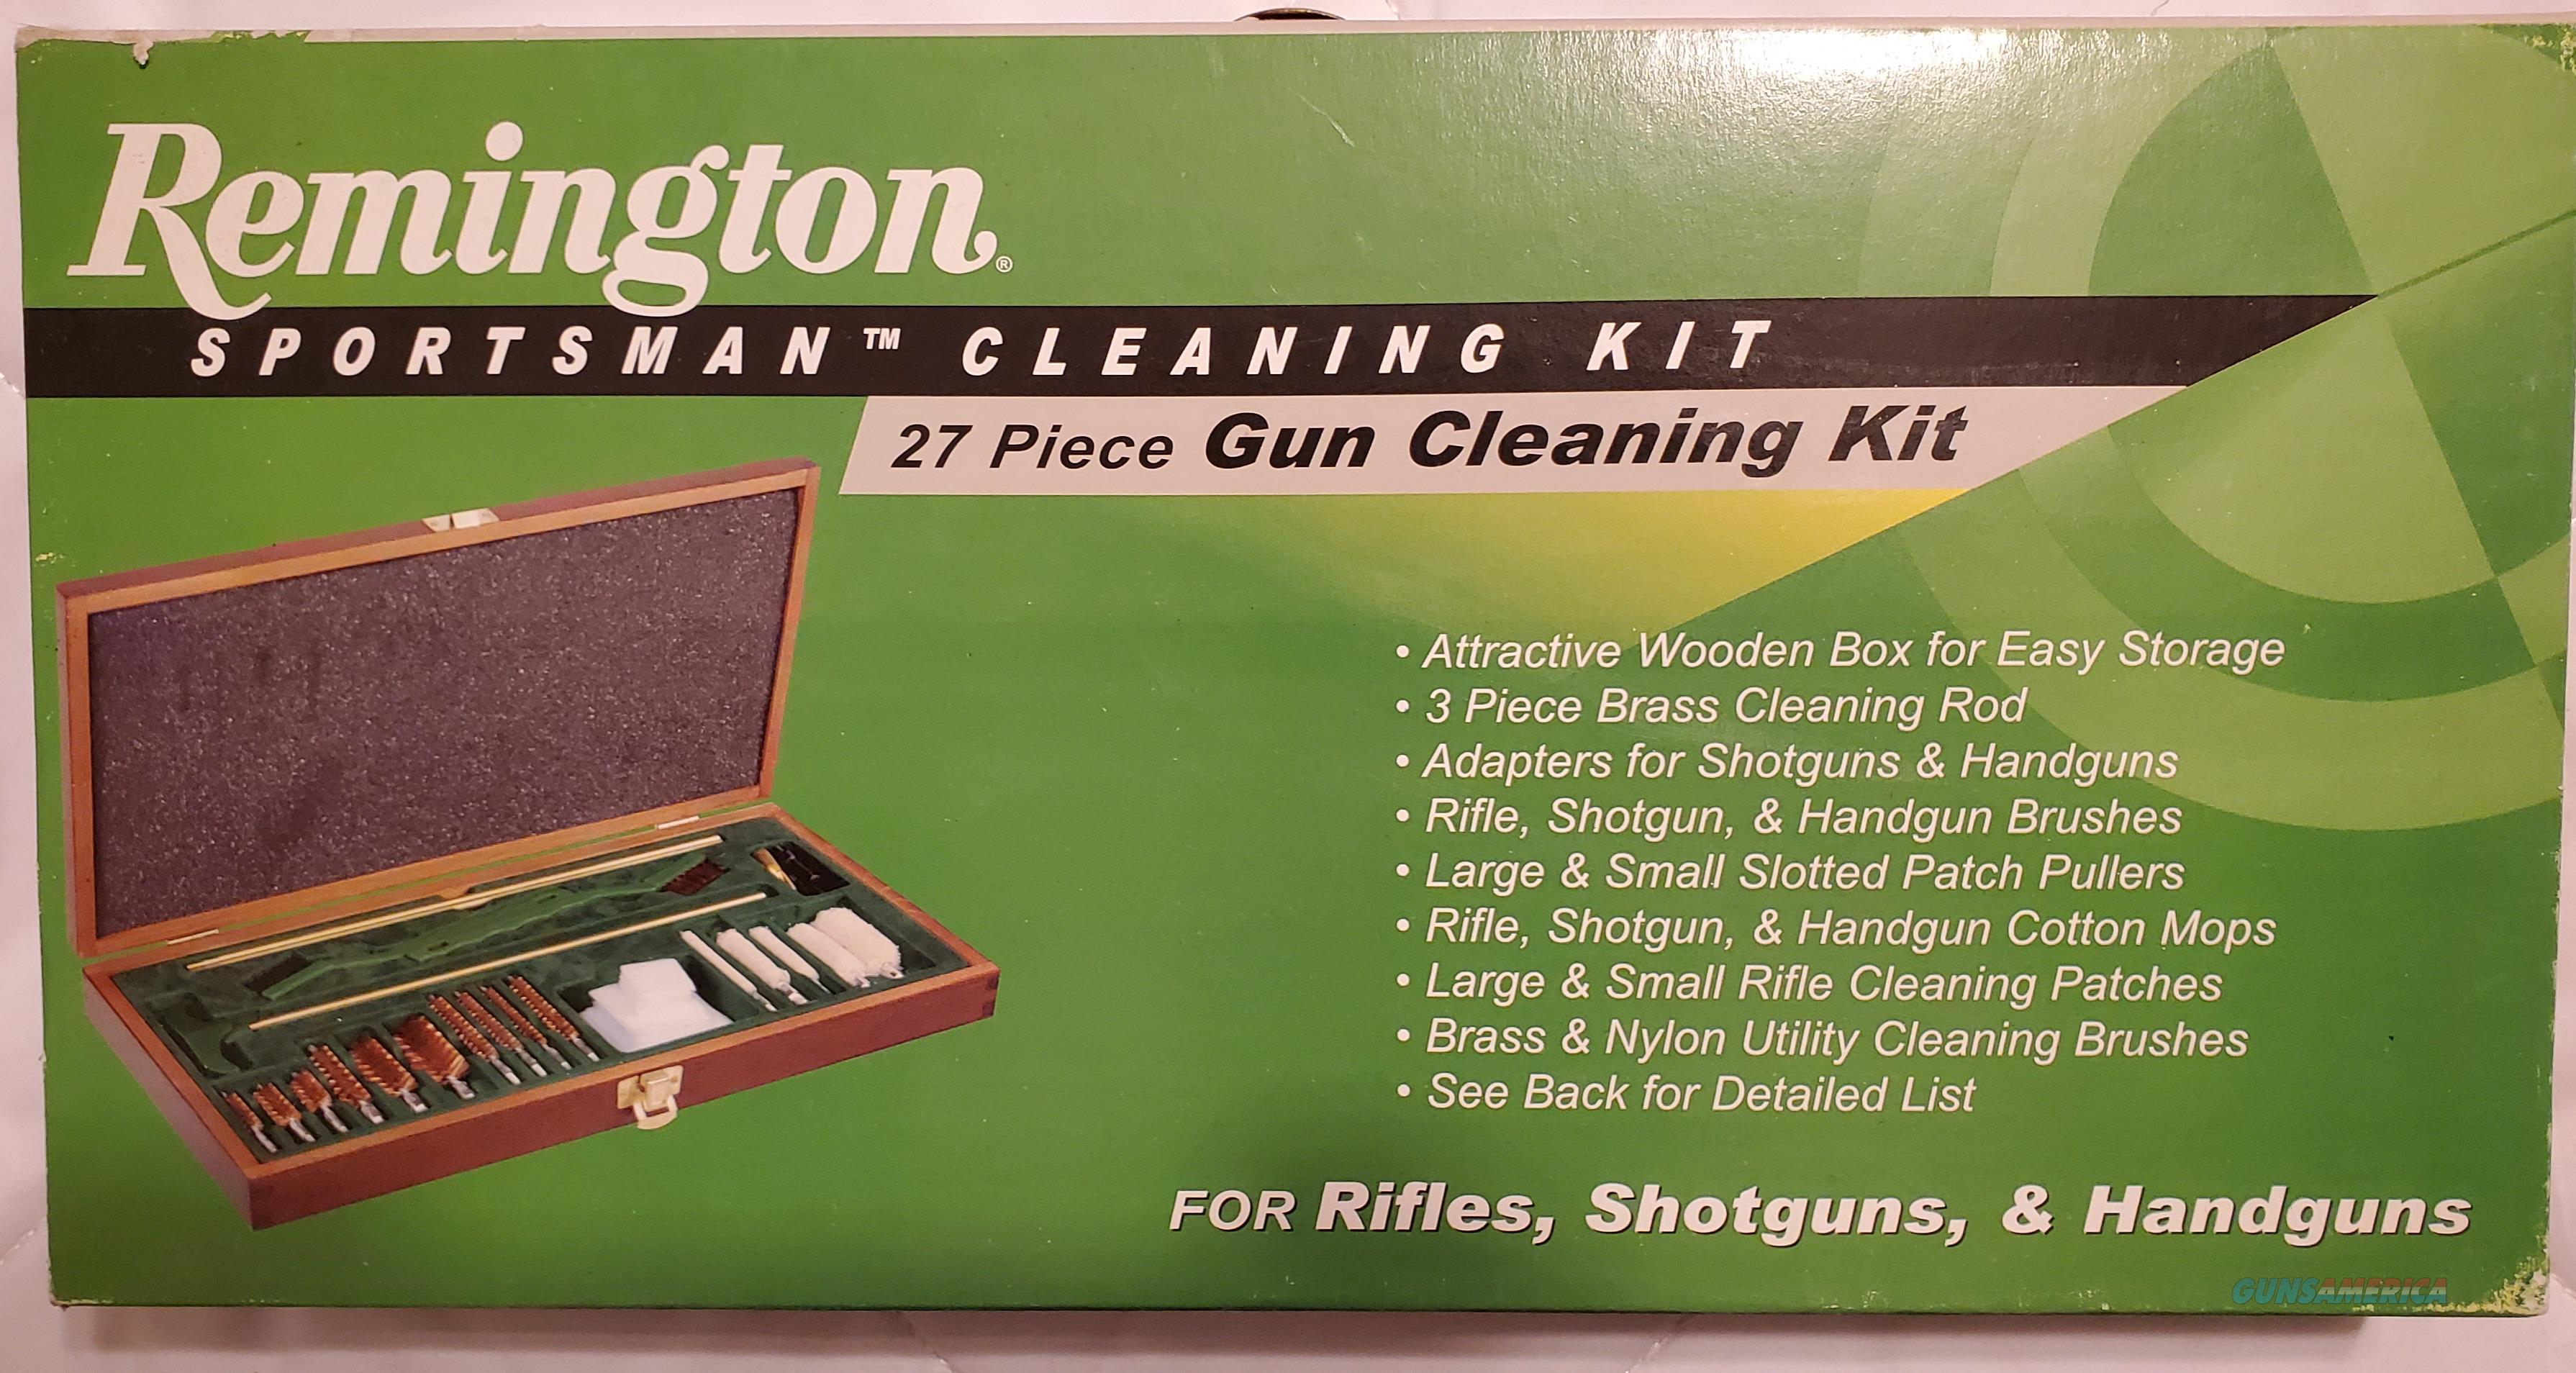 Remington Sportsman Universal GUN CLEANING KIT 27-Piece + Wood Case  New!  Non-Guns > Gunsmith Tools/Supplies